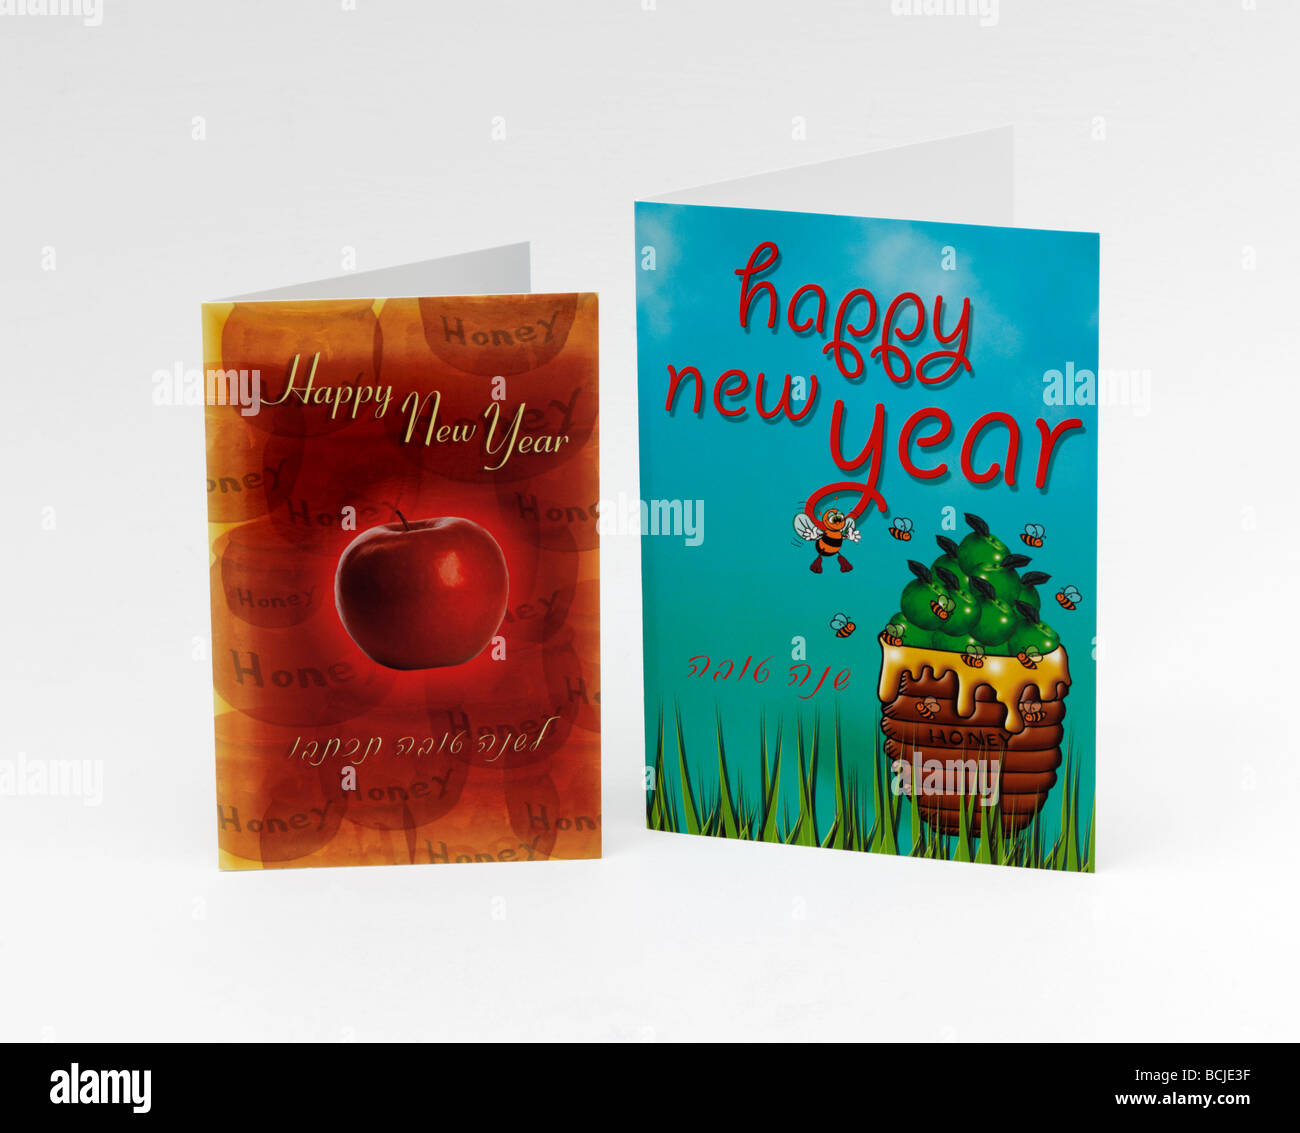 Rosh Hashanah Cards Jewish New Year Honey And Apples Traditionally